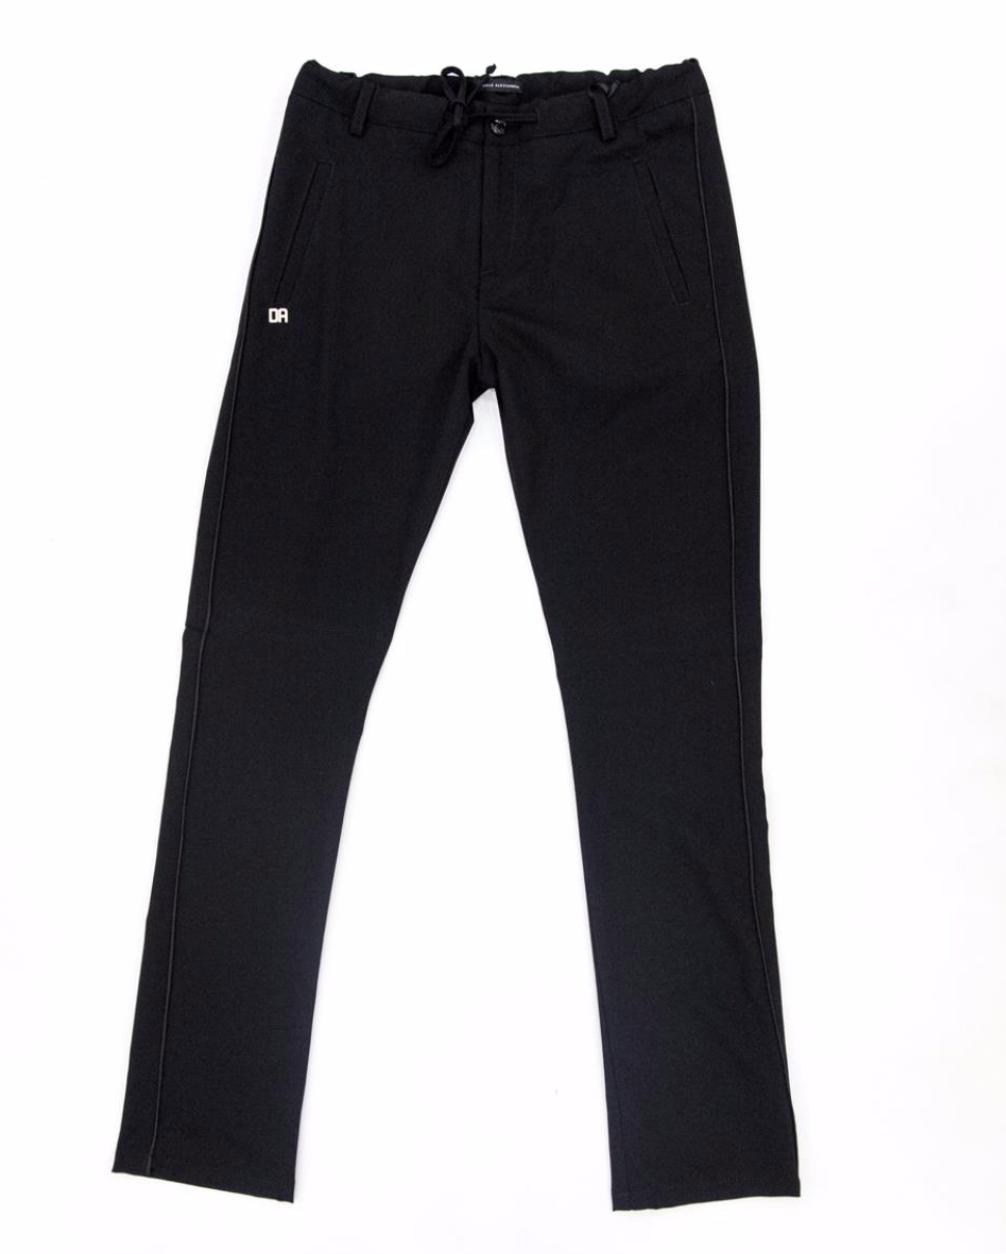 Pantalone nero daniele Alessandrini bambino DANIELE ALESSANDRINI | Pantalone | 1235P0712NERO